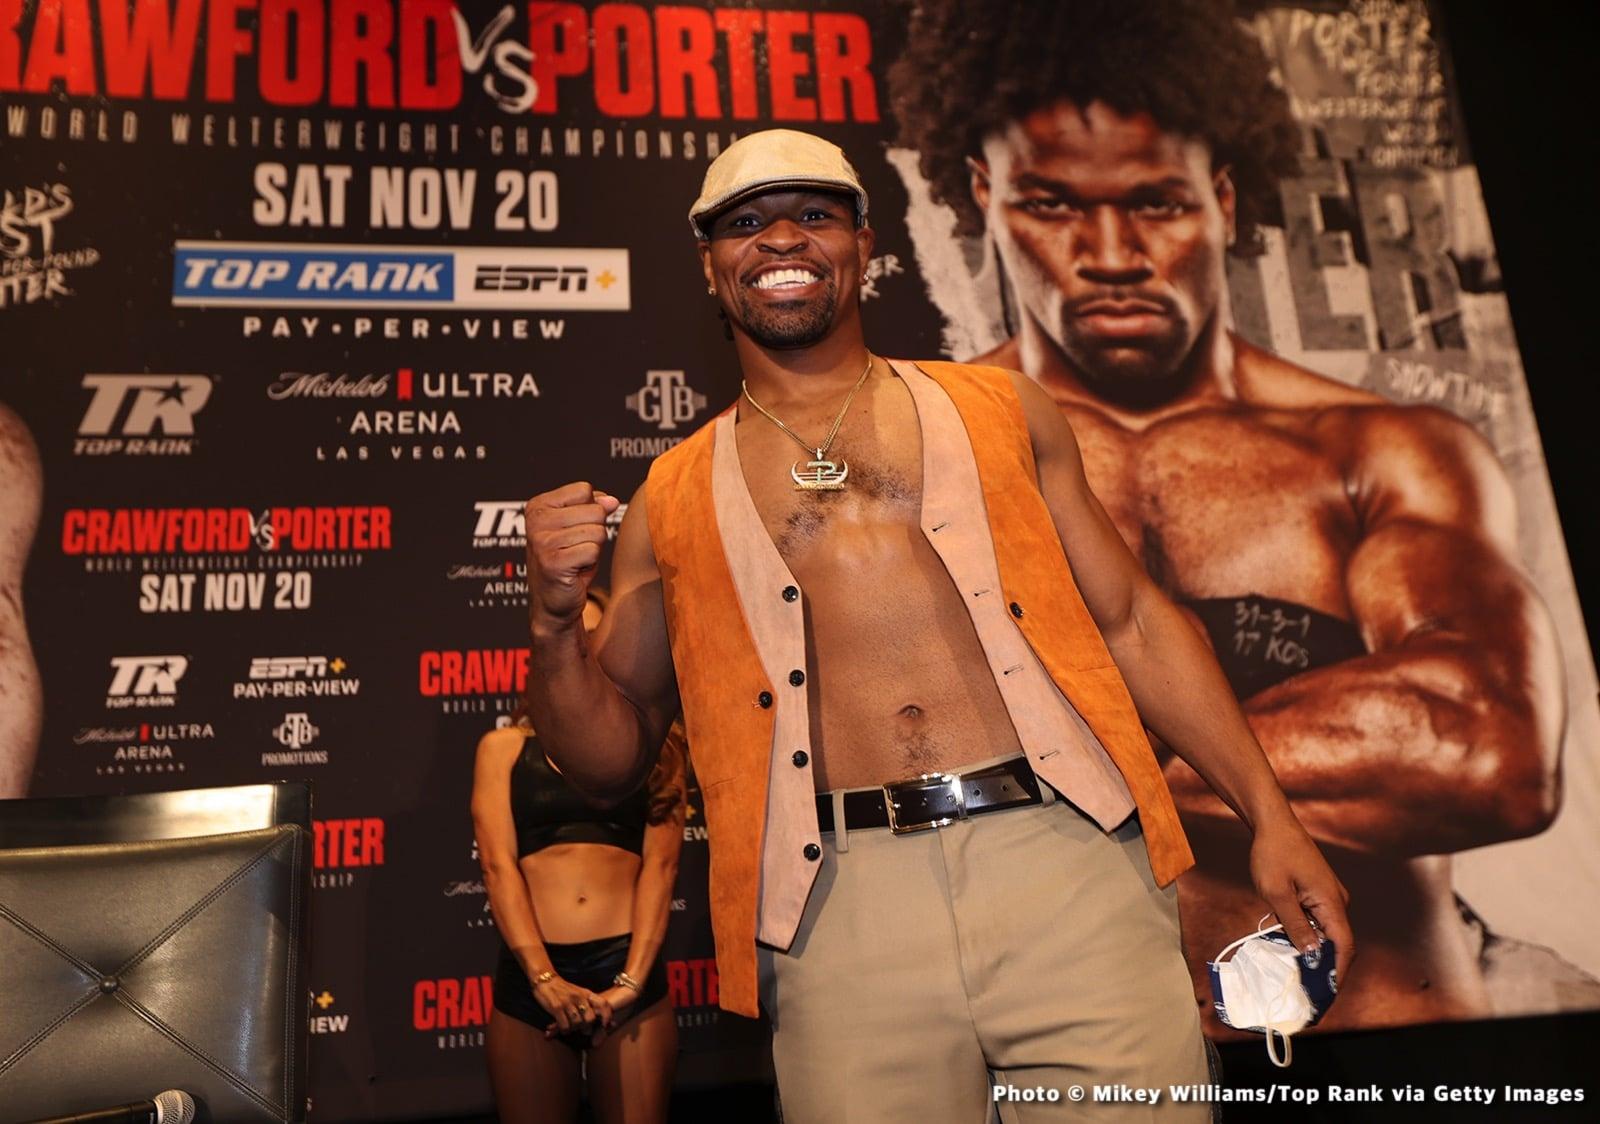 Shawn Porter - Boxing News